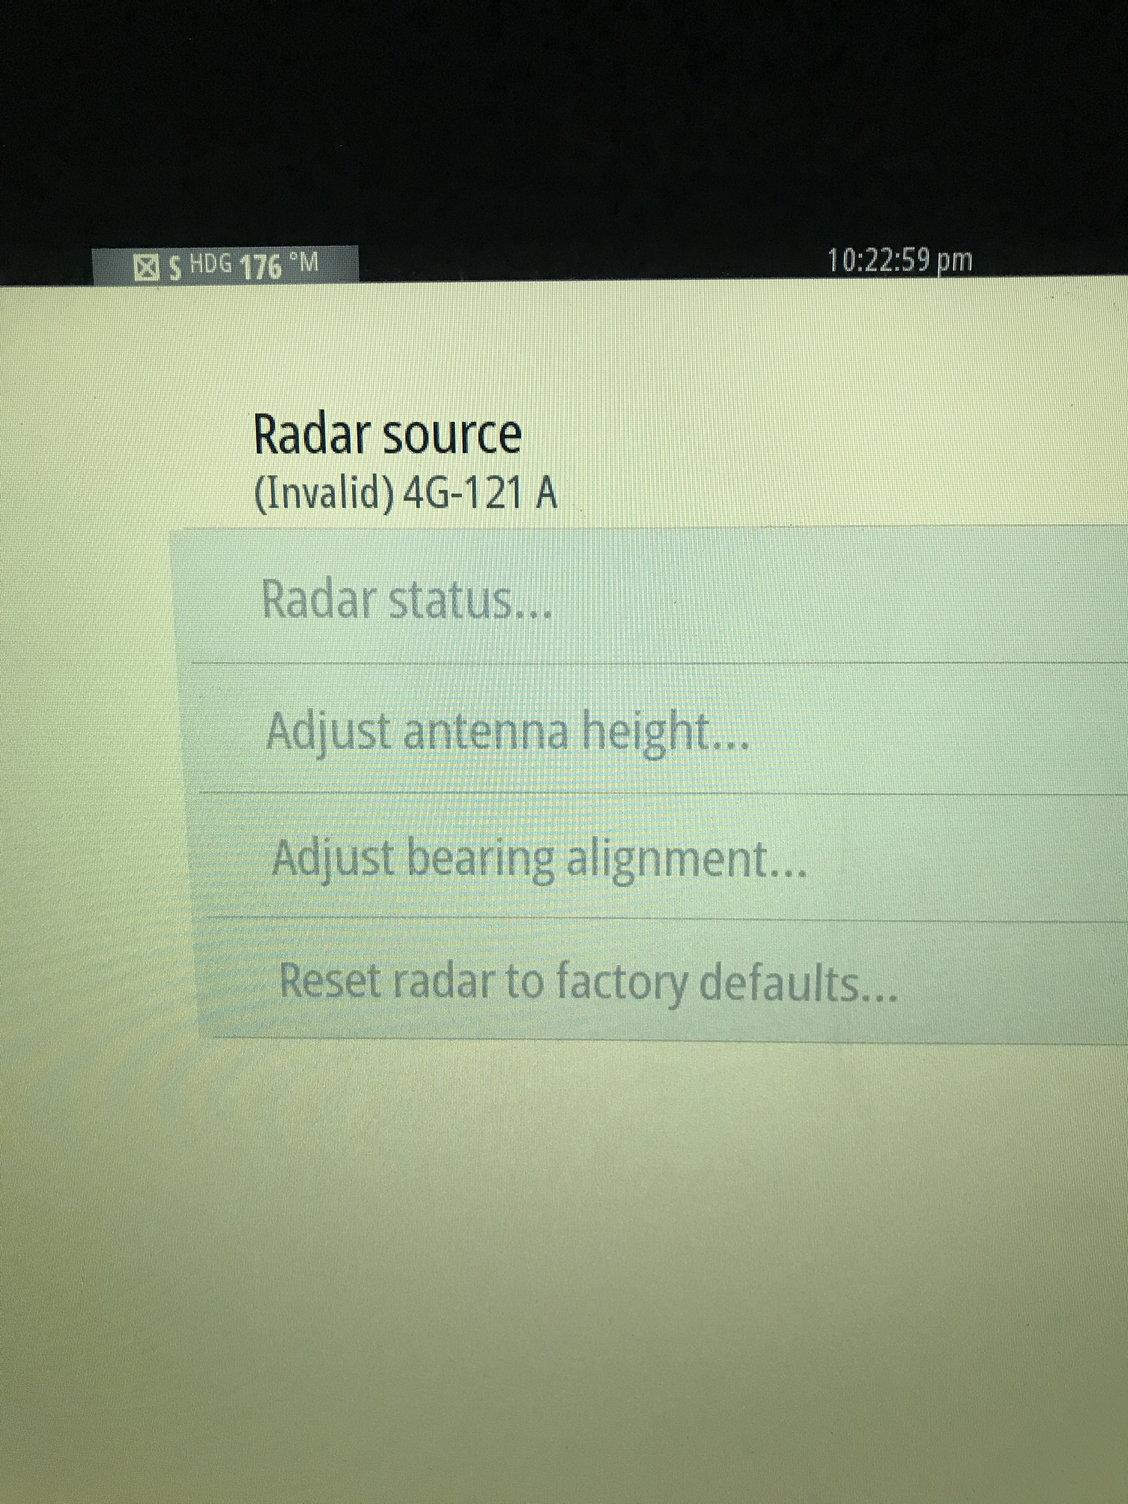 need help Simrad 4G Radar unknown radar scanner error - The